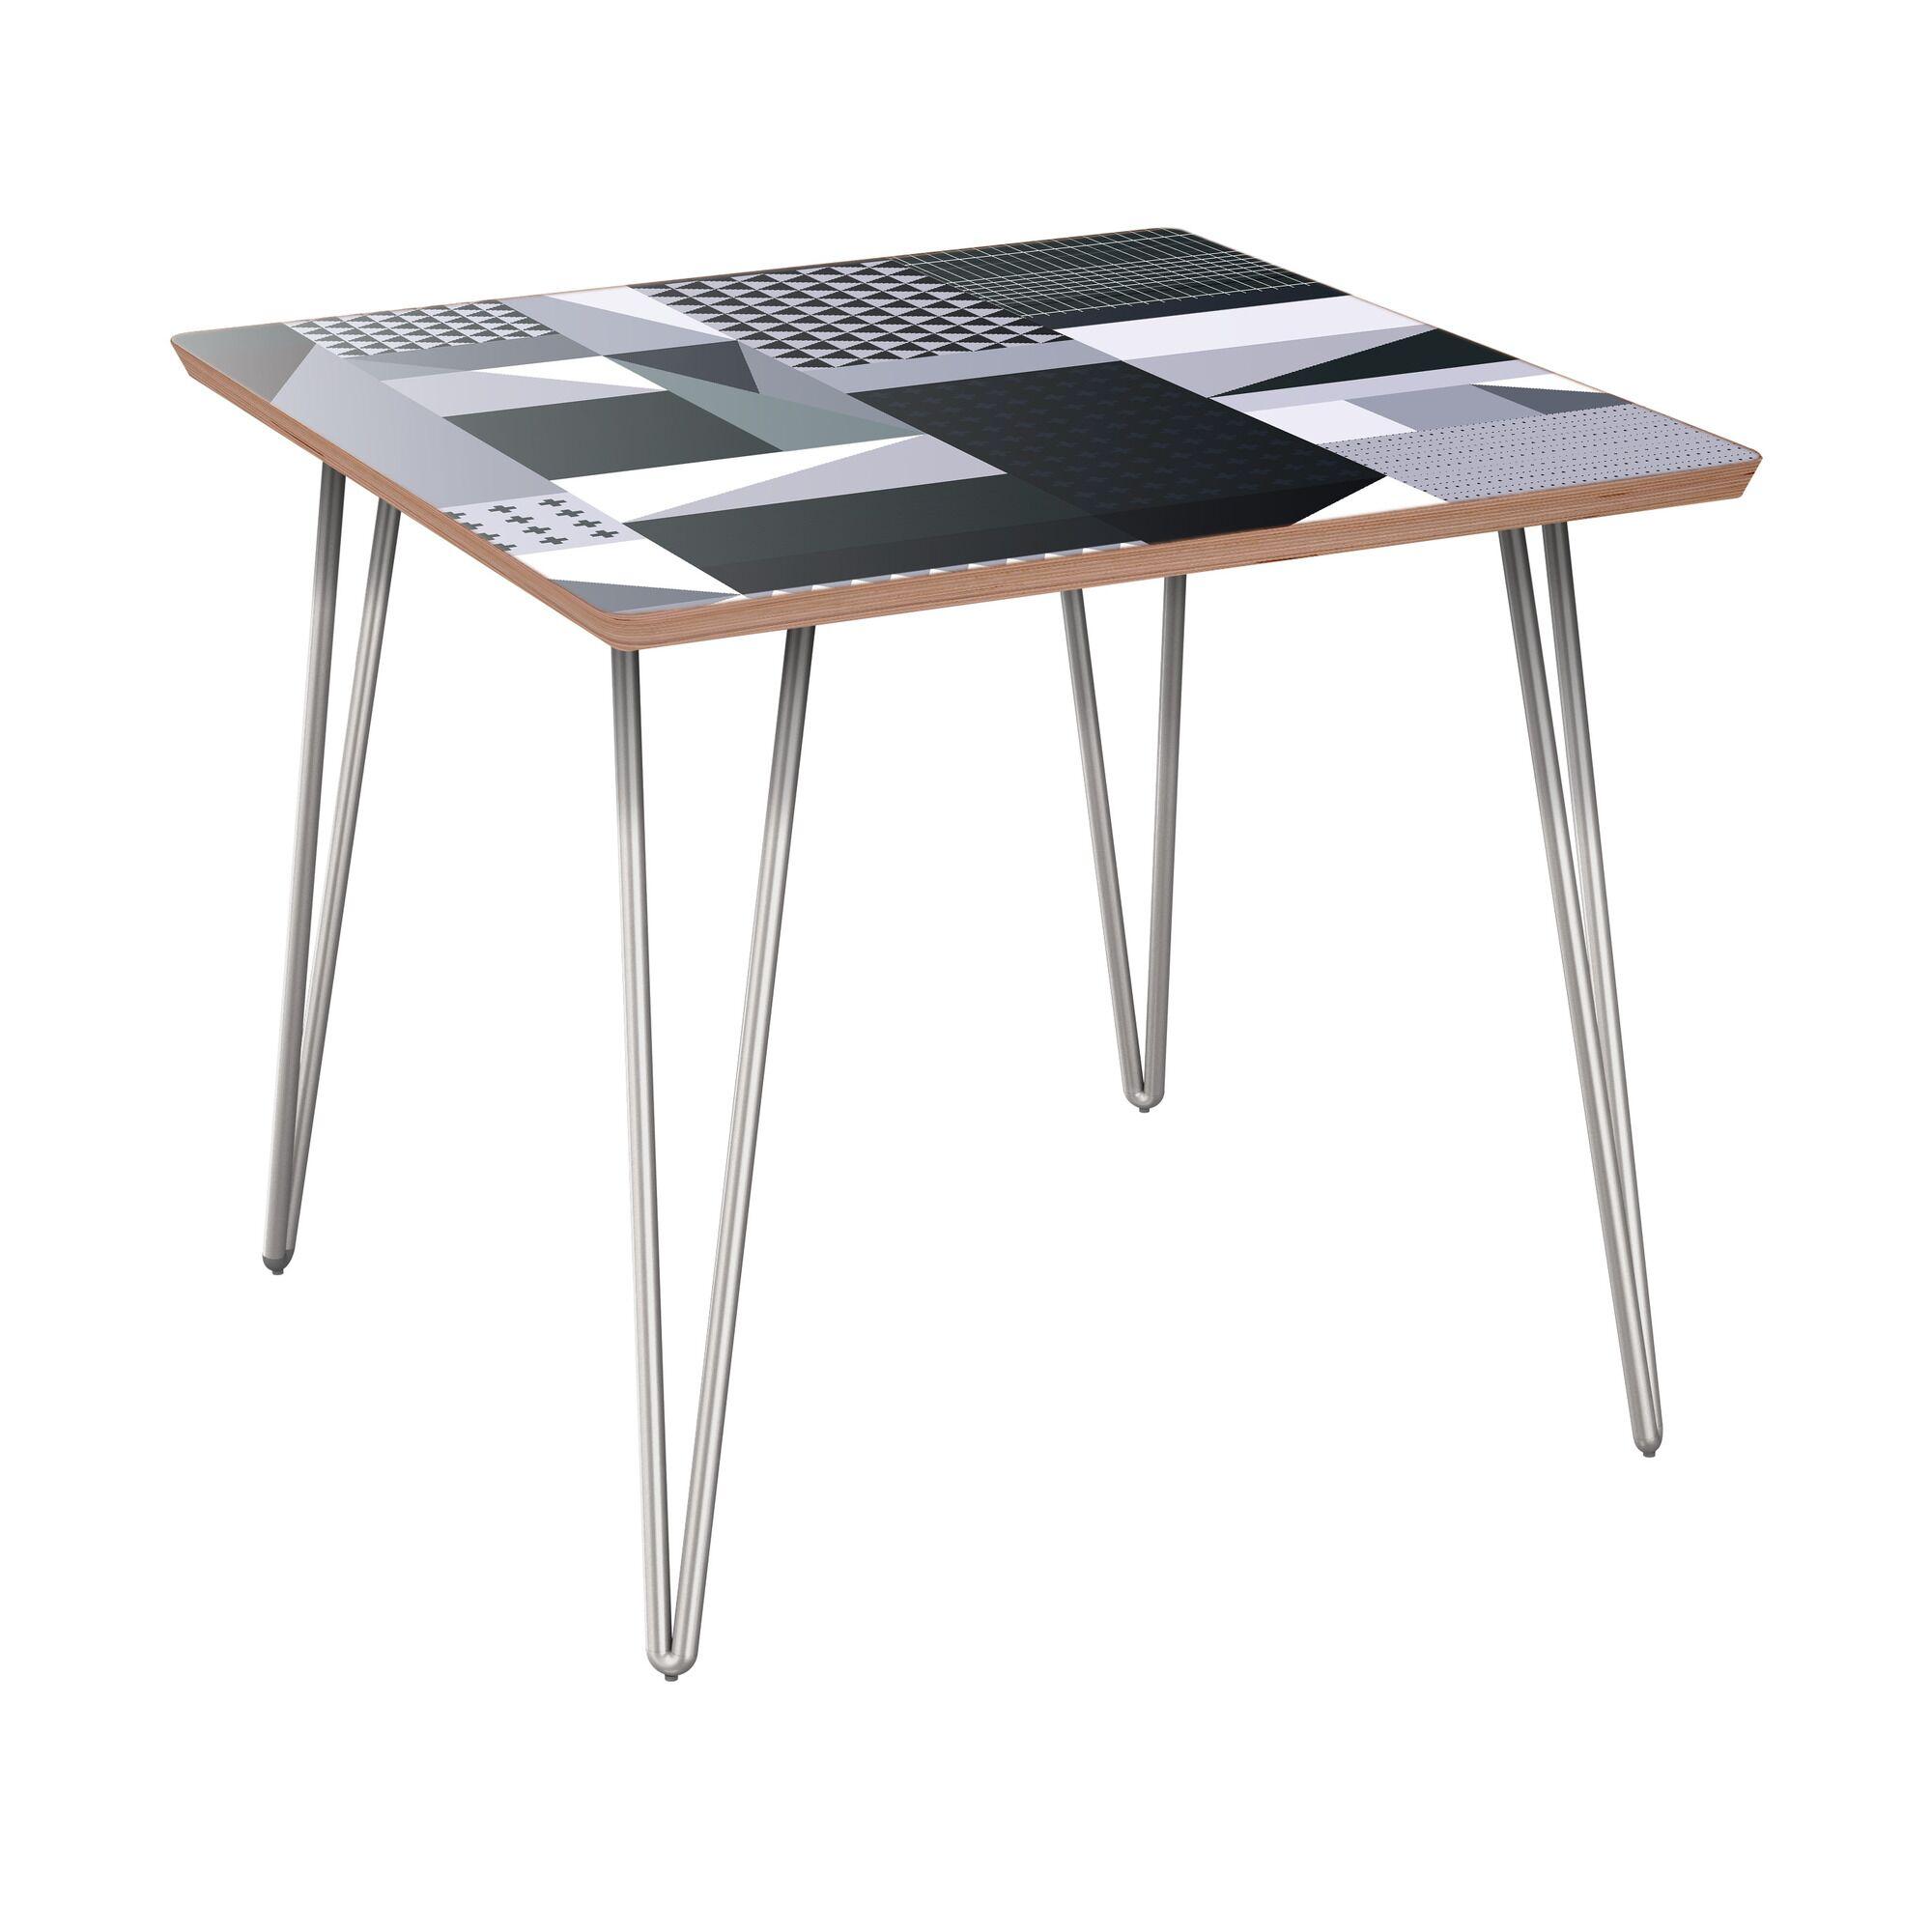 Killingworth End Table Table Base Color: Chrome, Table Top Color: Walnut